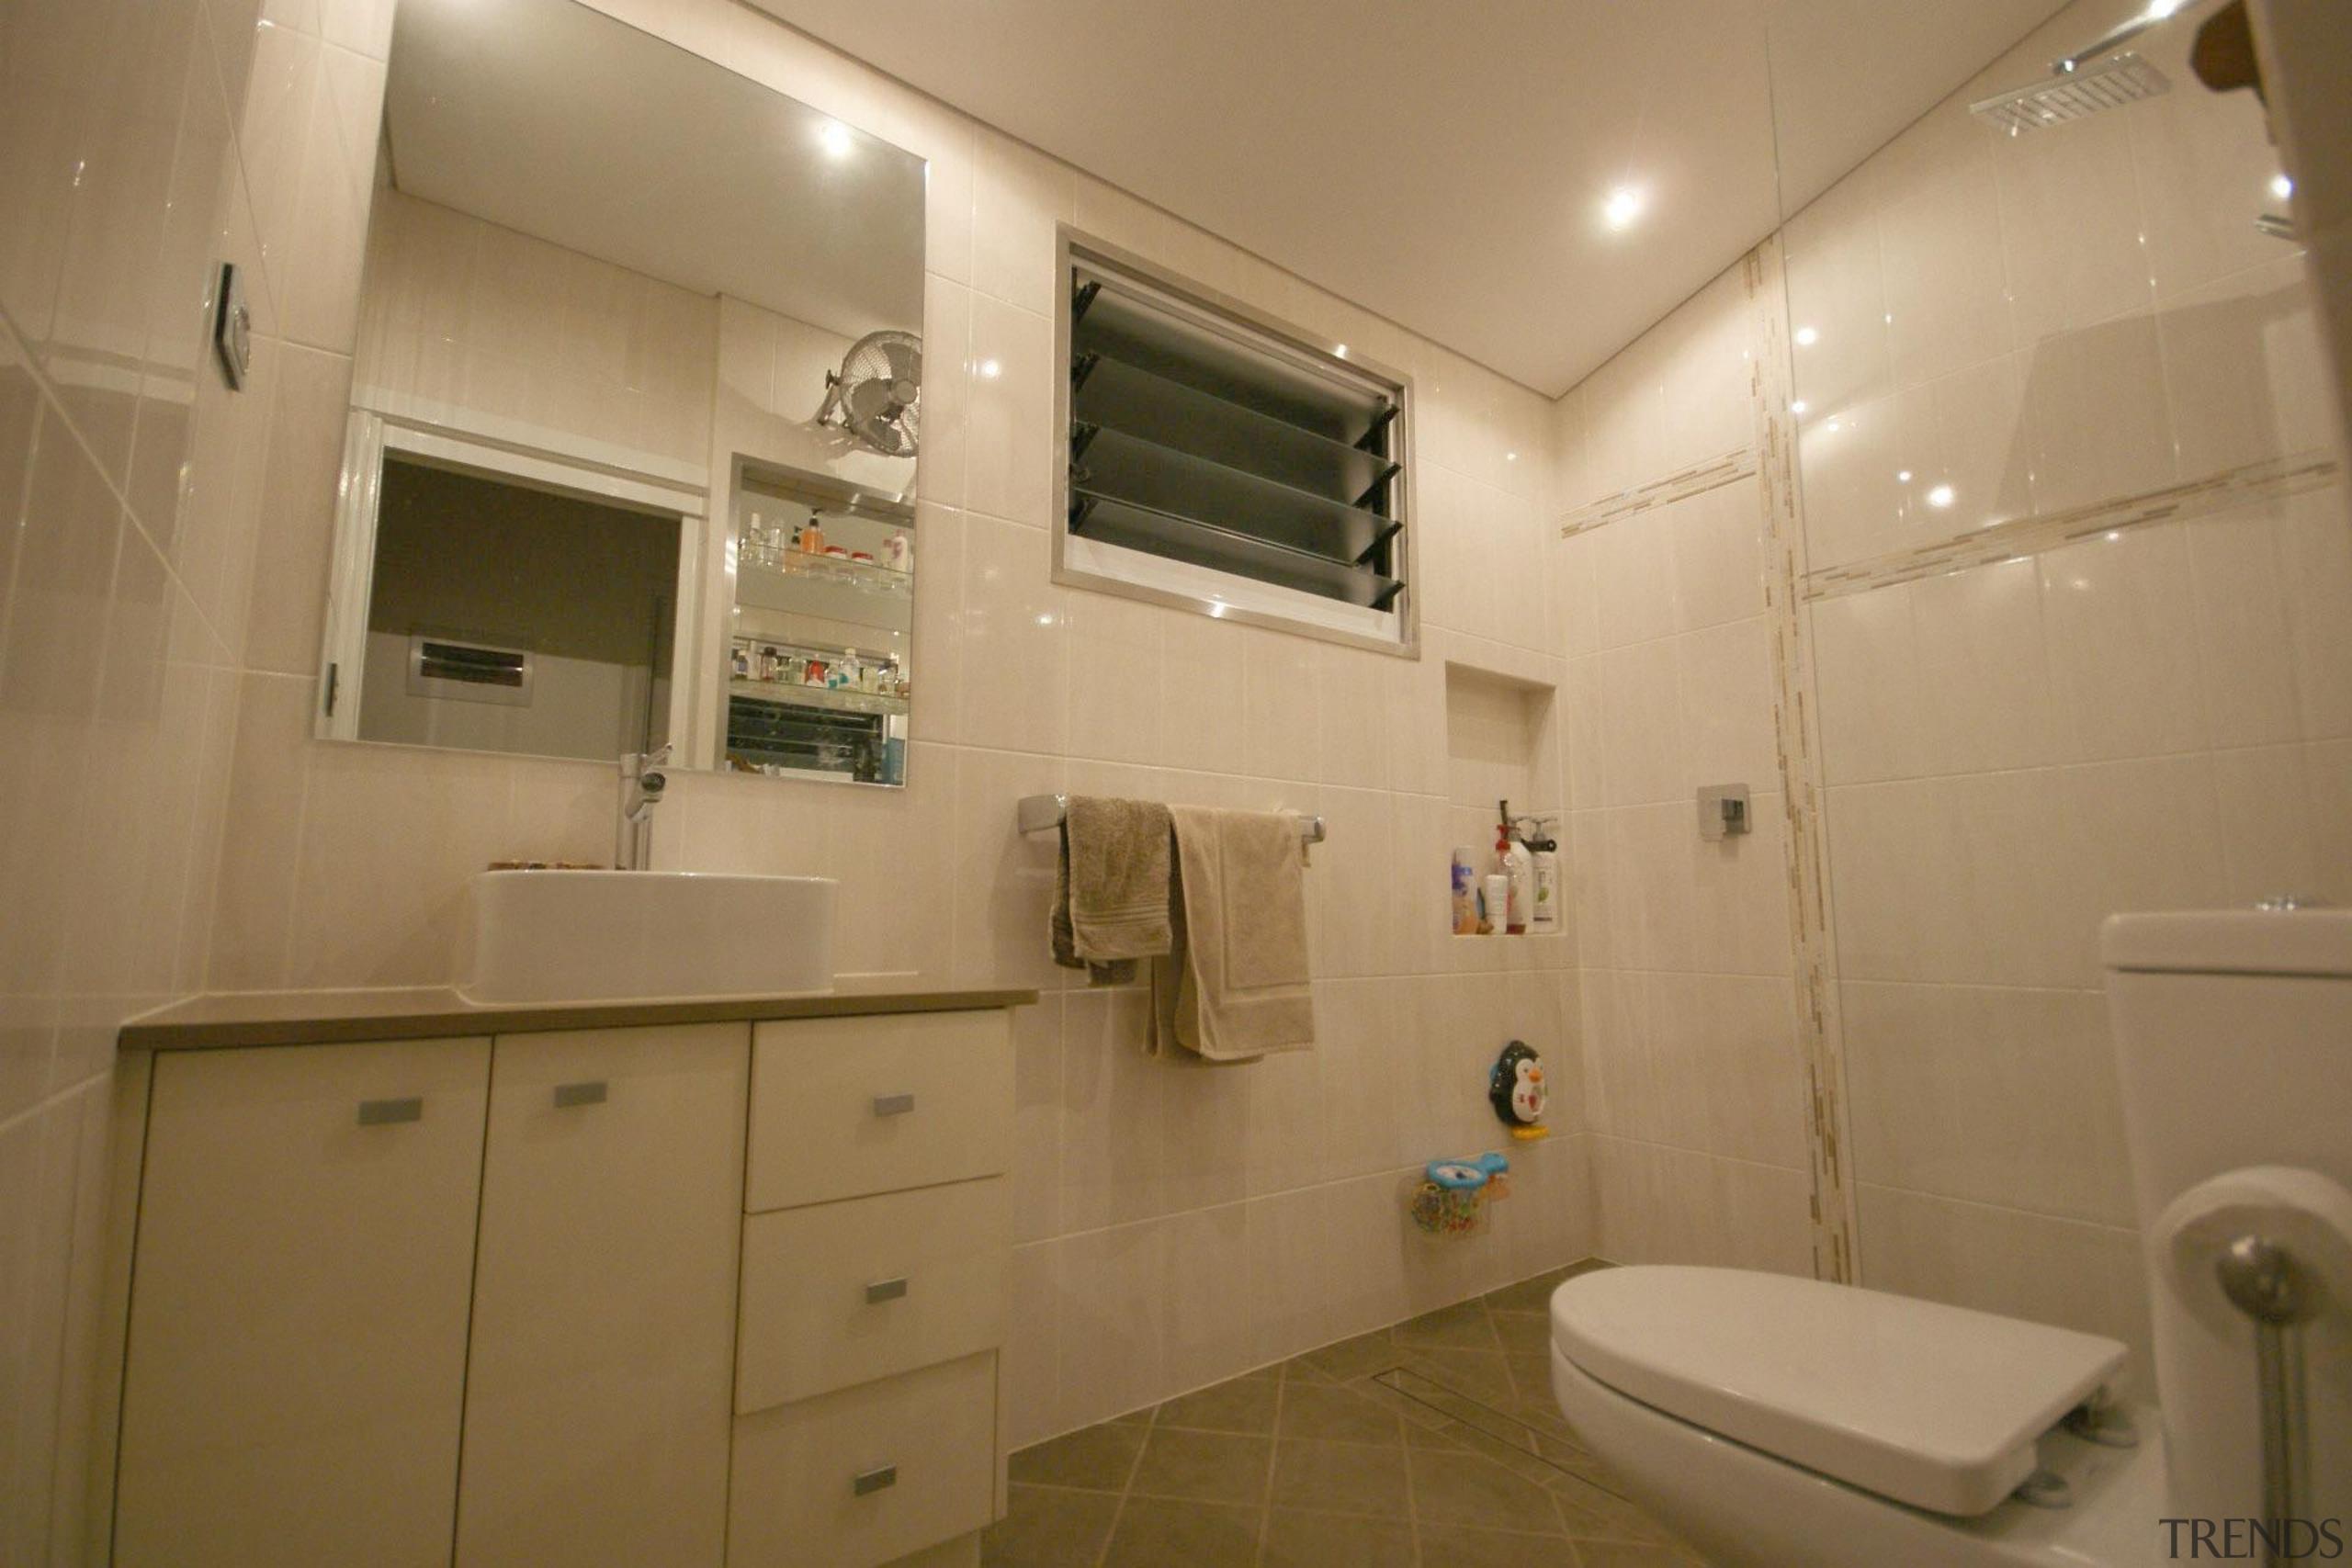 Winner Bathroom of the Year 2013 Northern Territory bathroom, home, interior design, plumbing fixture, property, real estate, room, brown, orange